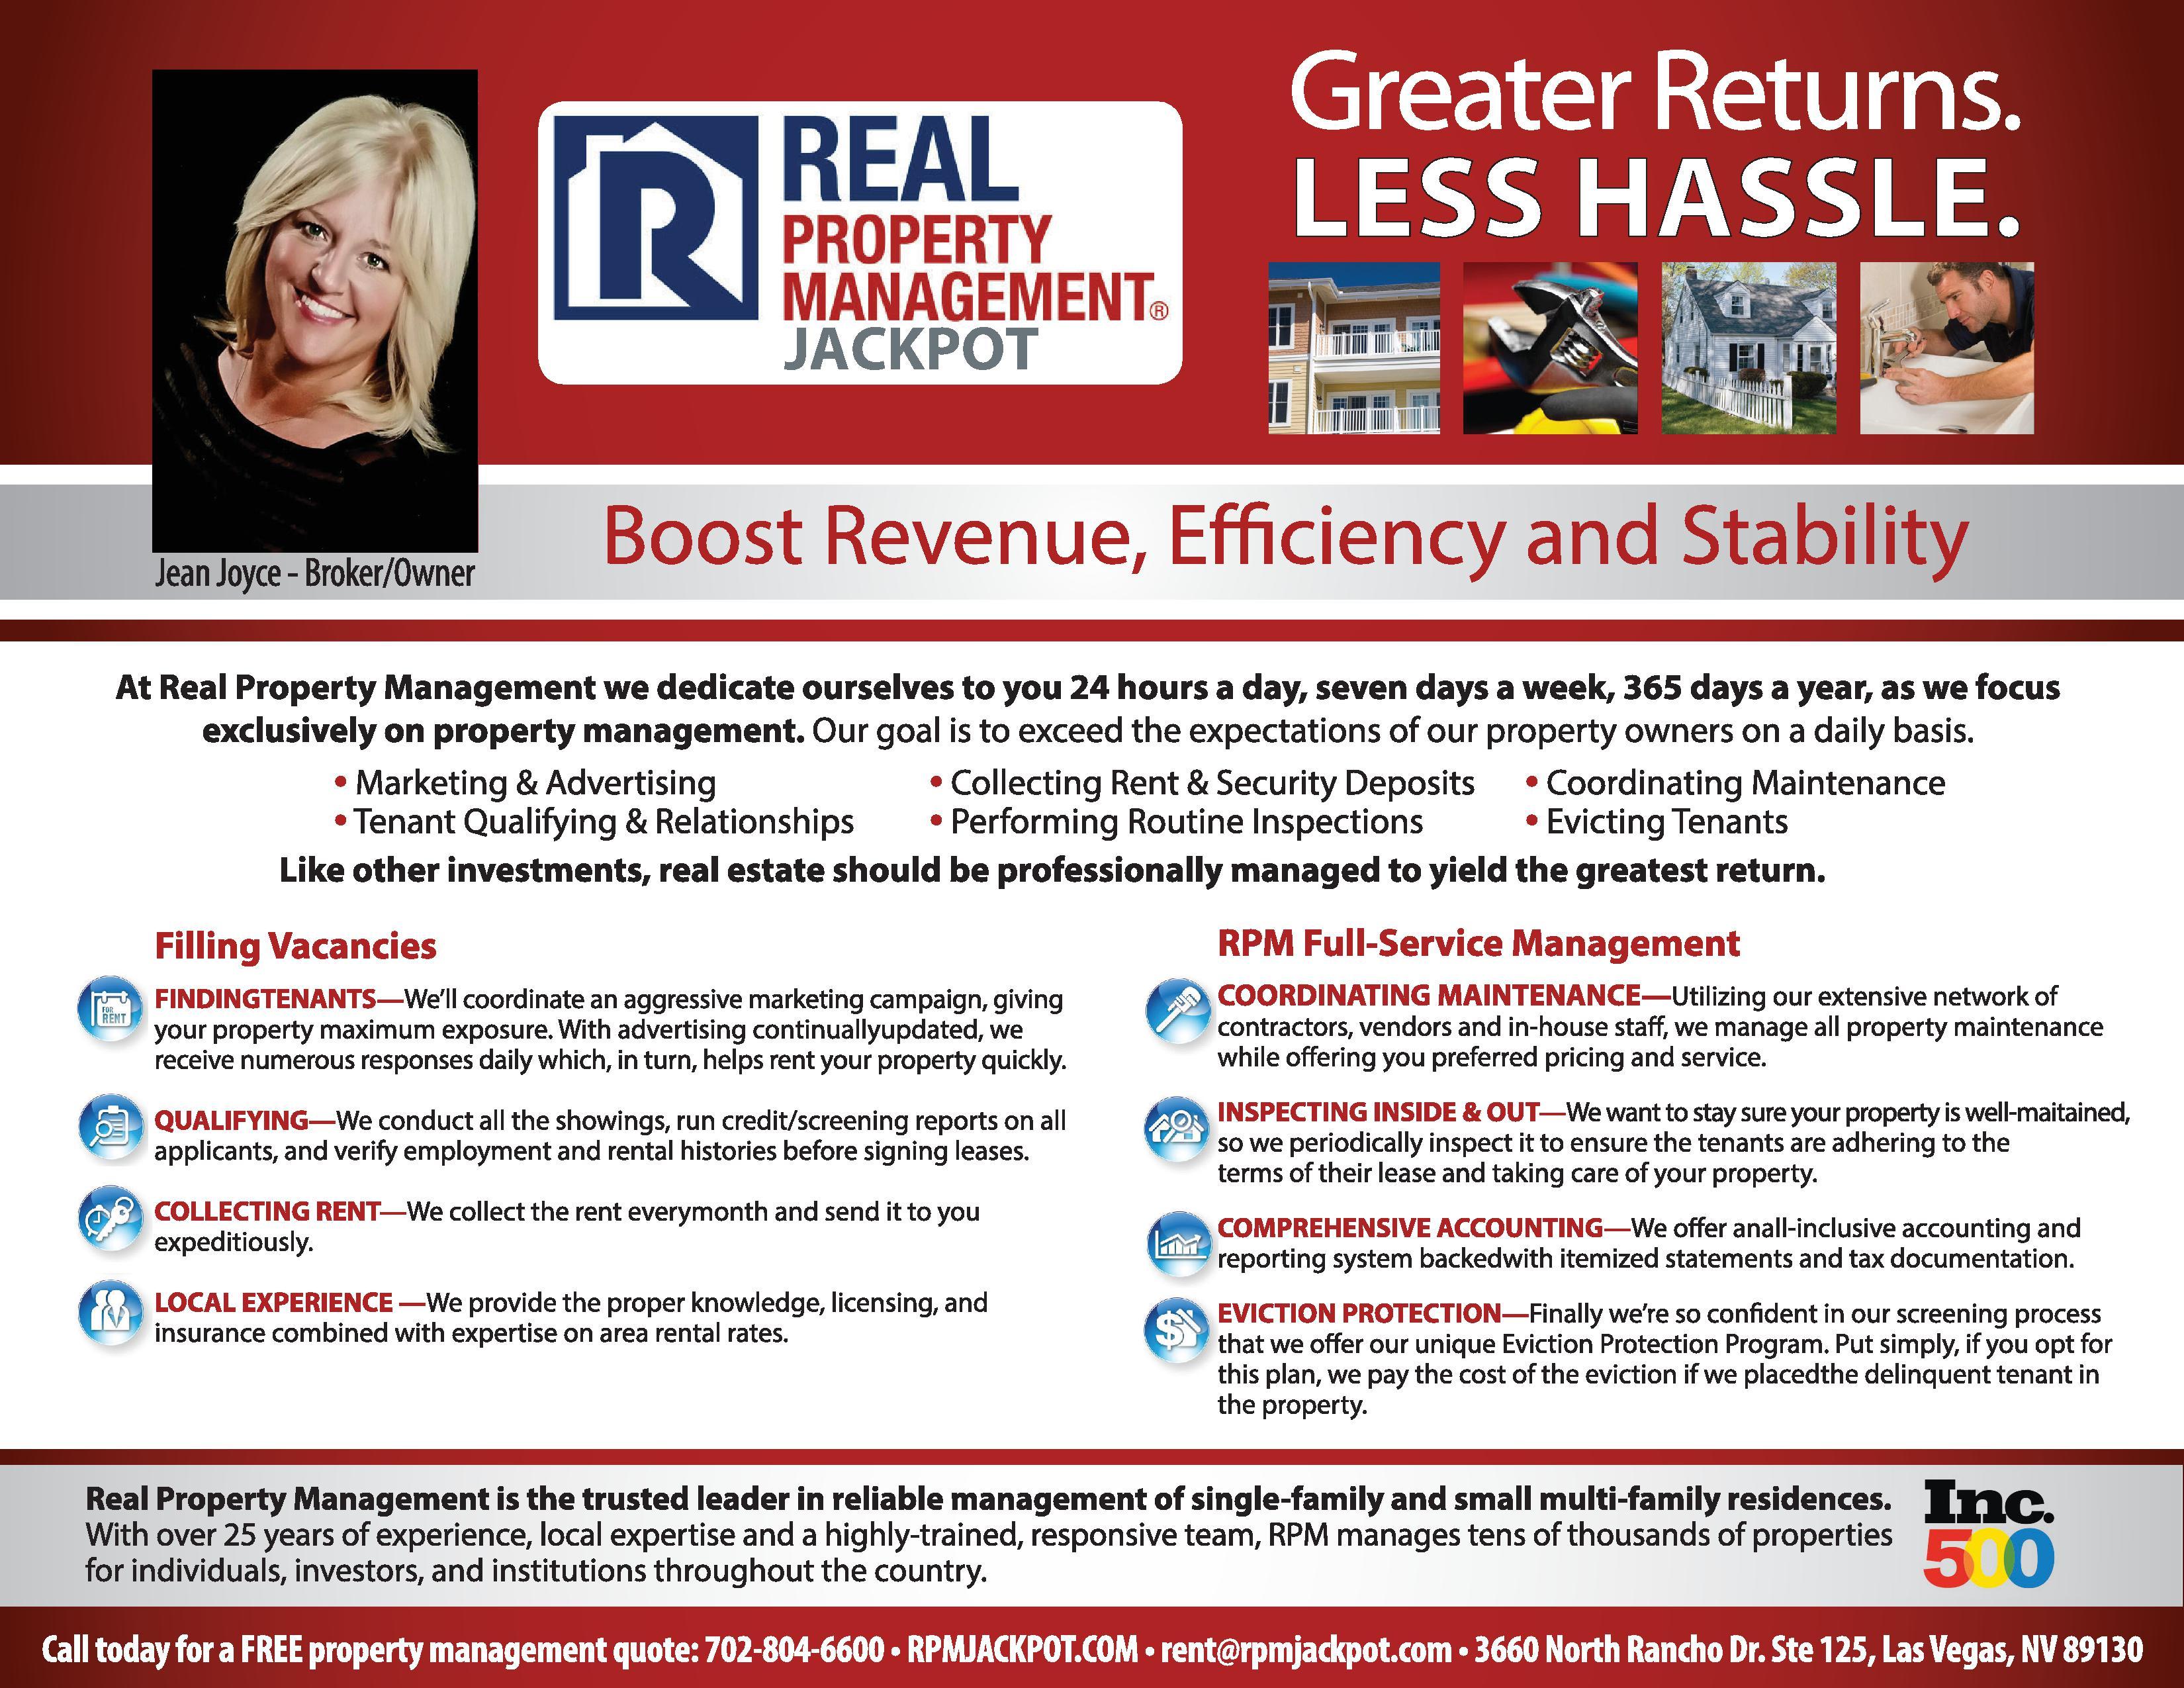 Real Property Management  Jackpot